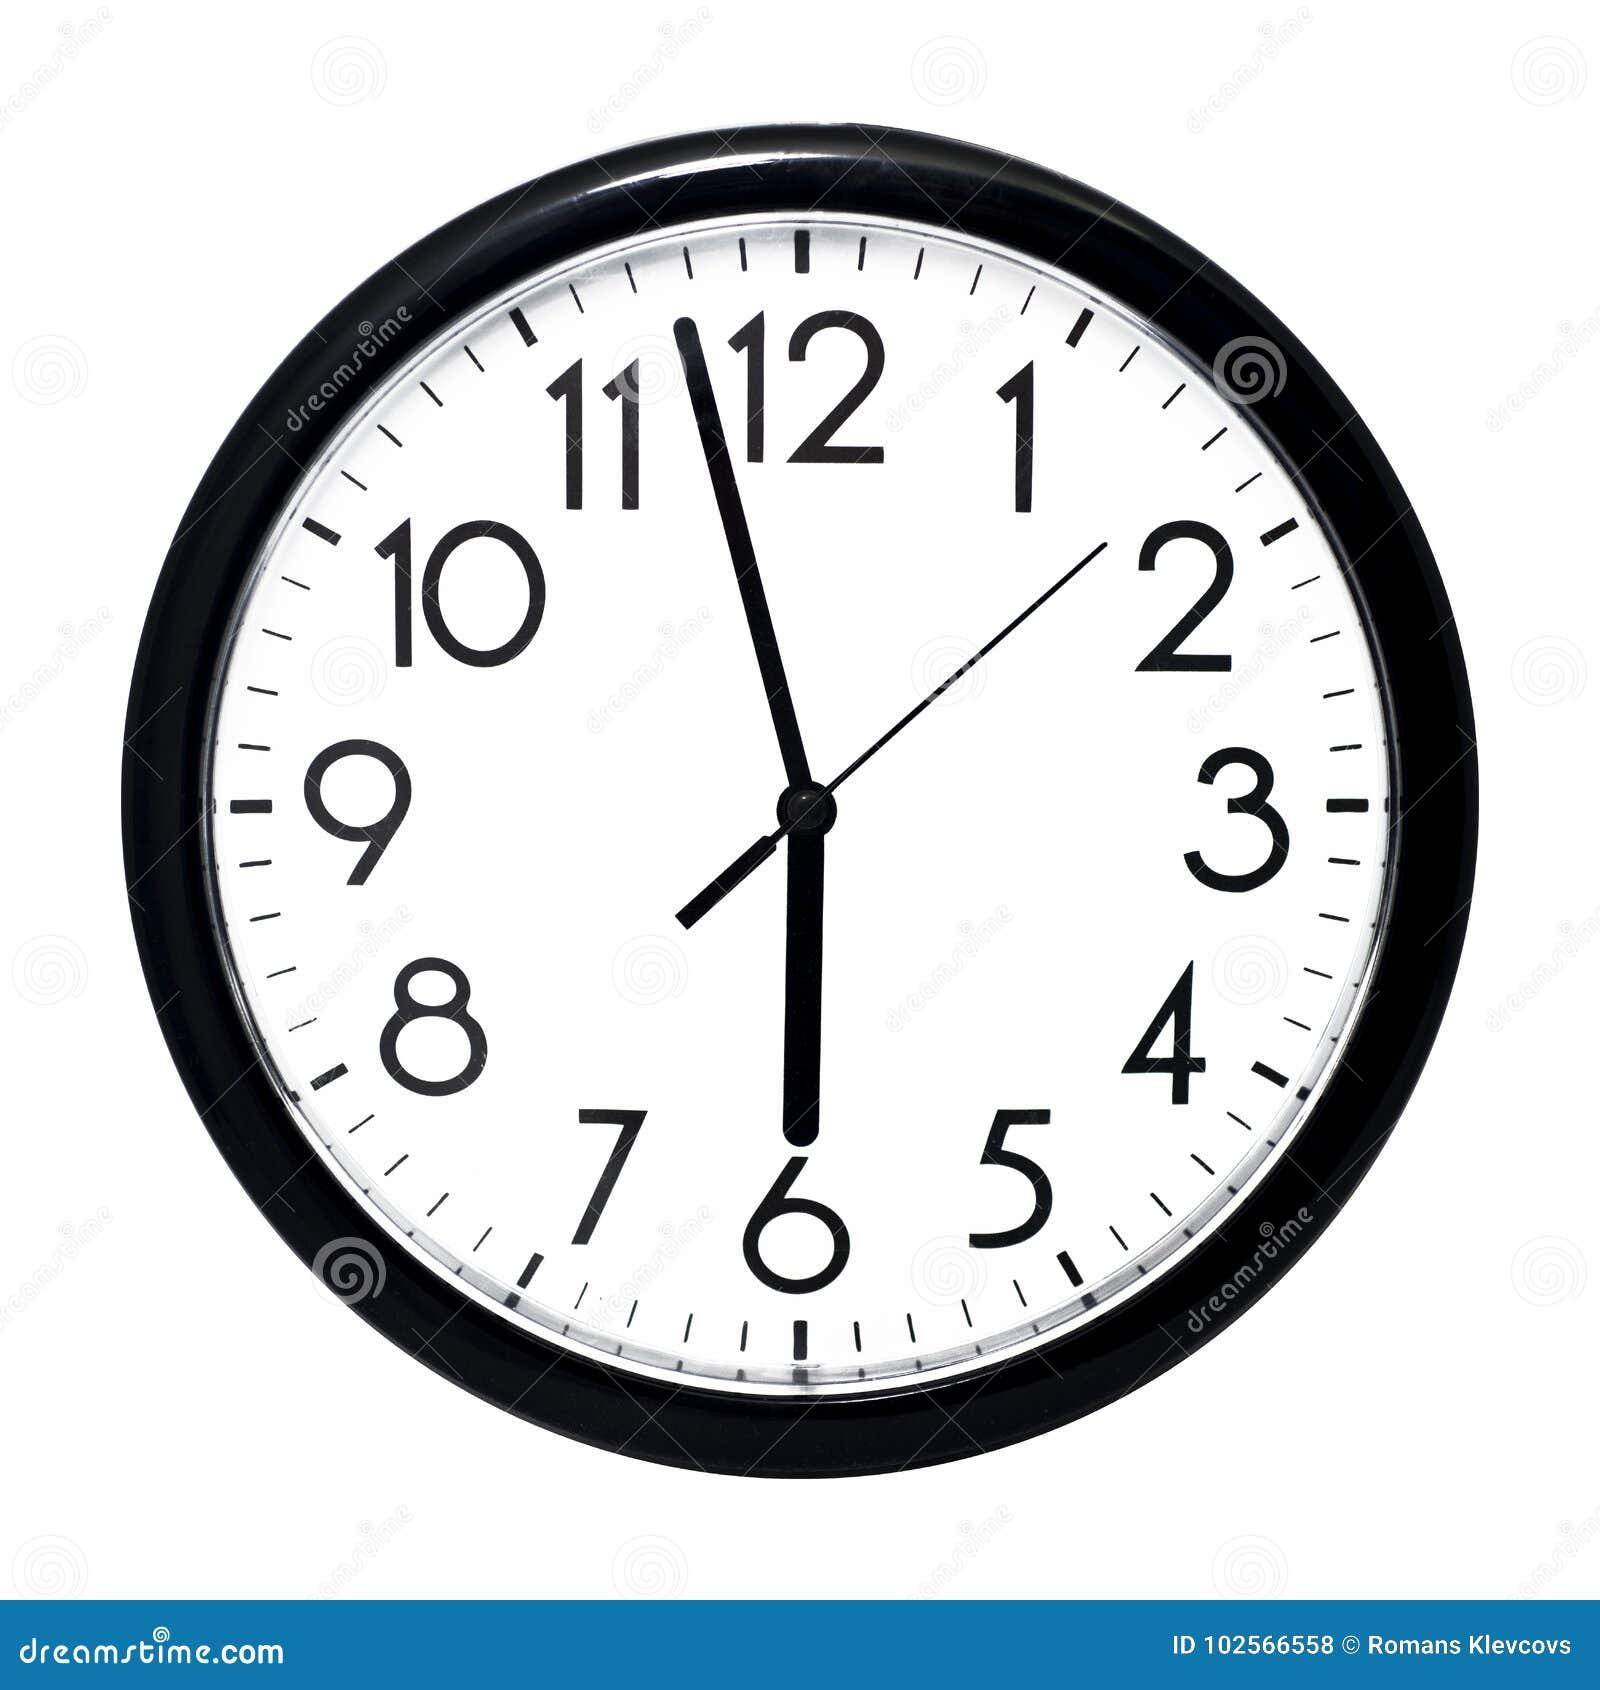 horloge murale blanche d 39 isolement sur le fond blanc photo stock image du neuf dessin 102566558. Black Bedroom Furniture Sets. Home Design Ideas